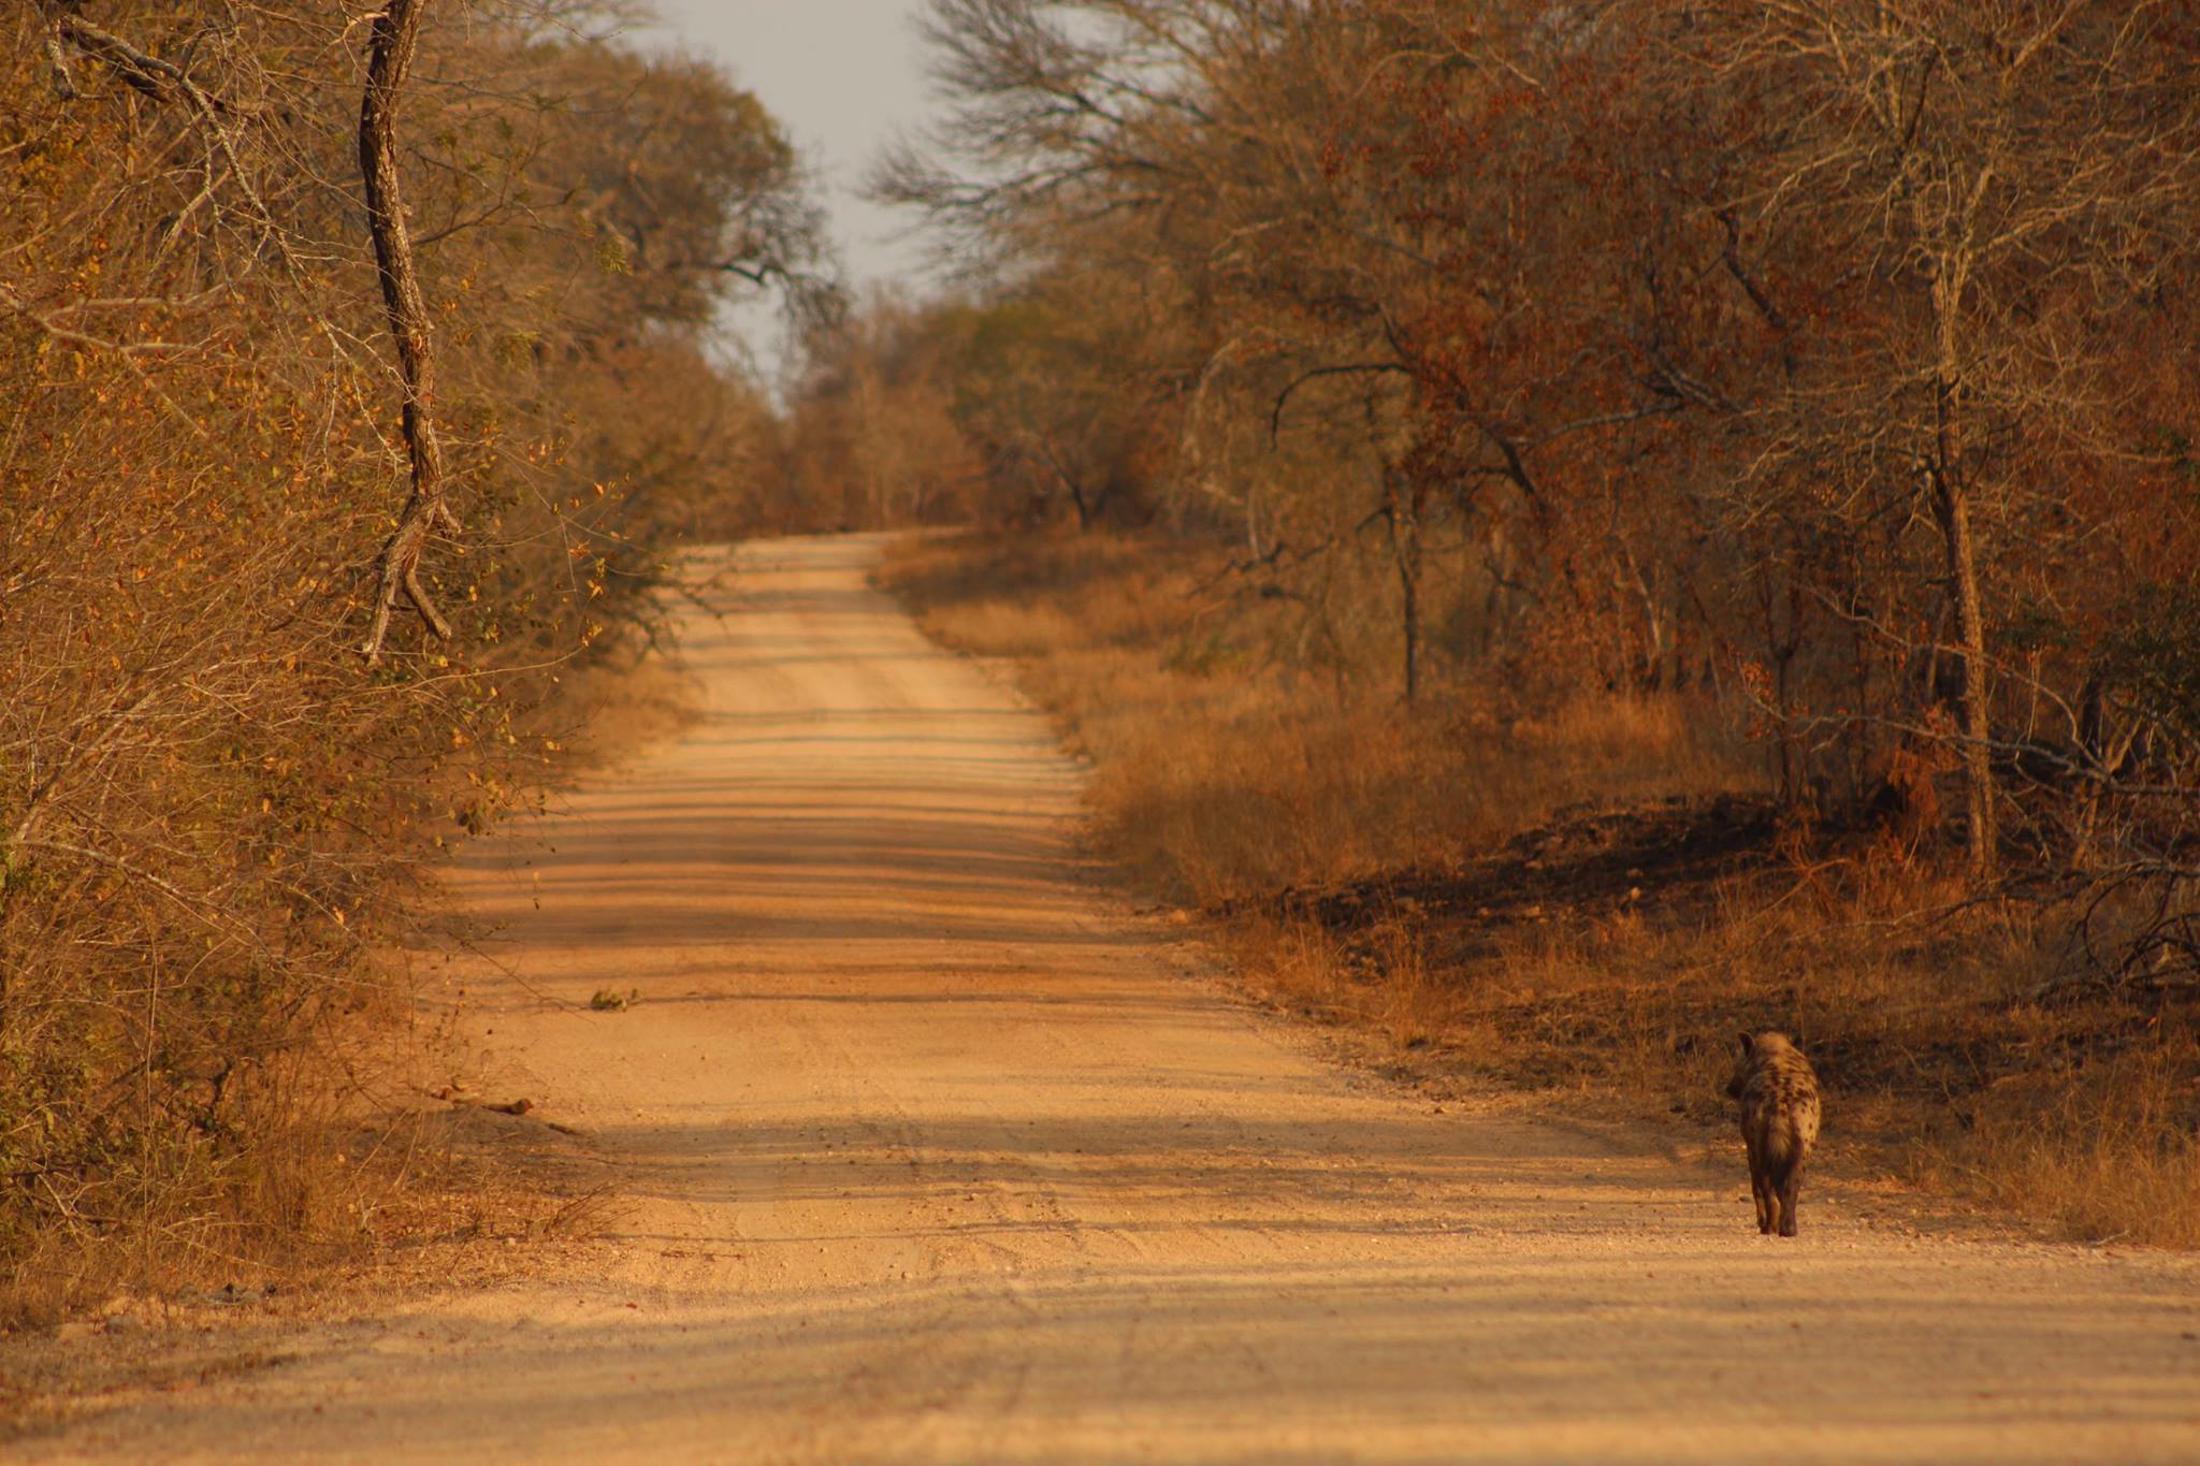 Safari & Natuur reizen Afrika - Hyena op onverharde weg in Kruger National Park